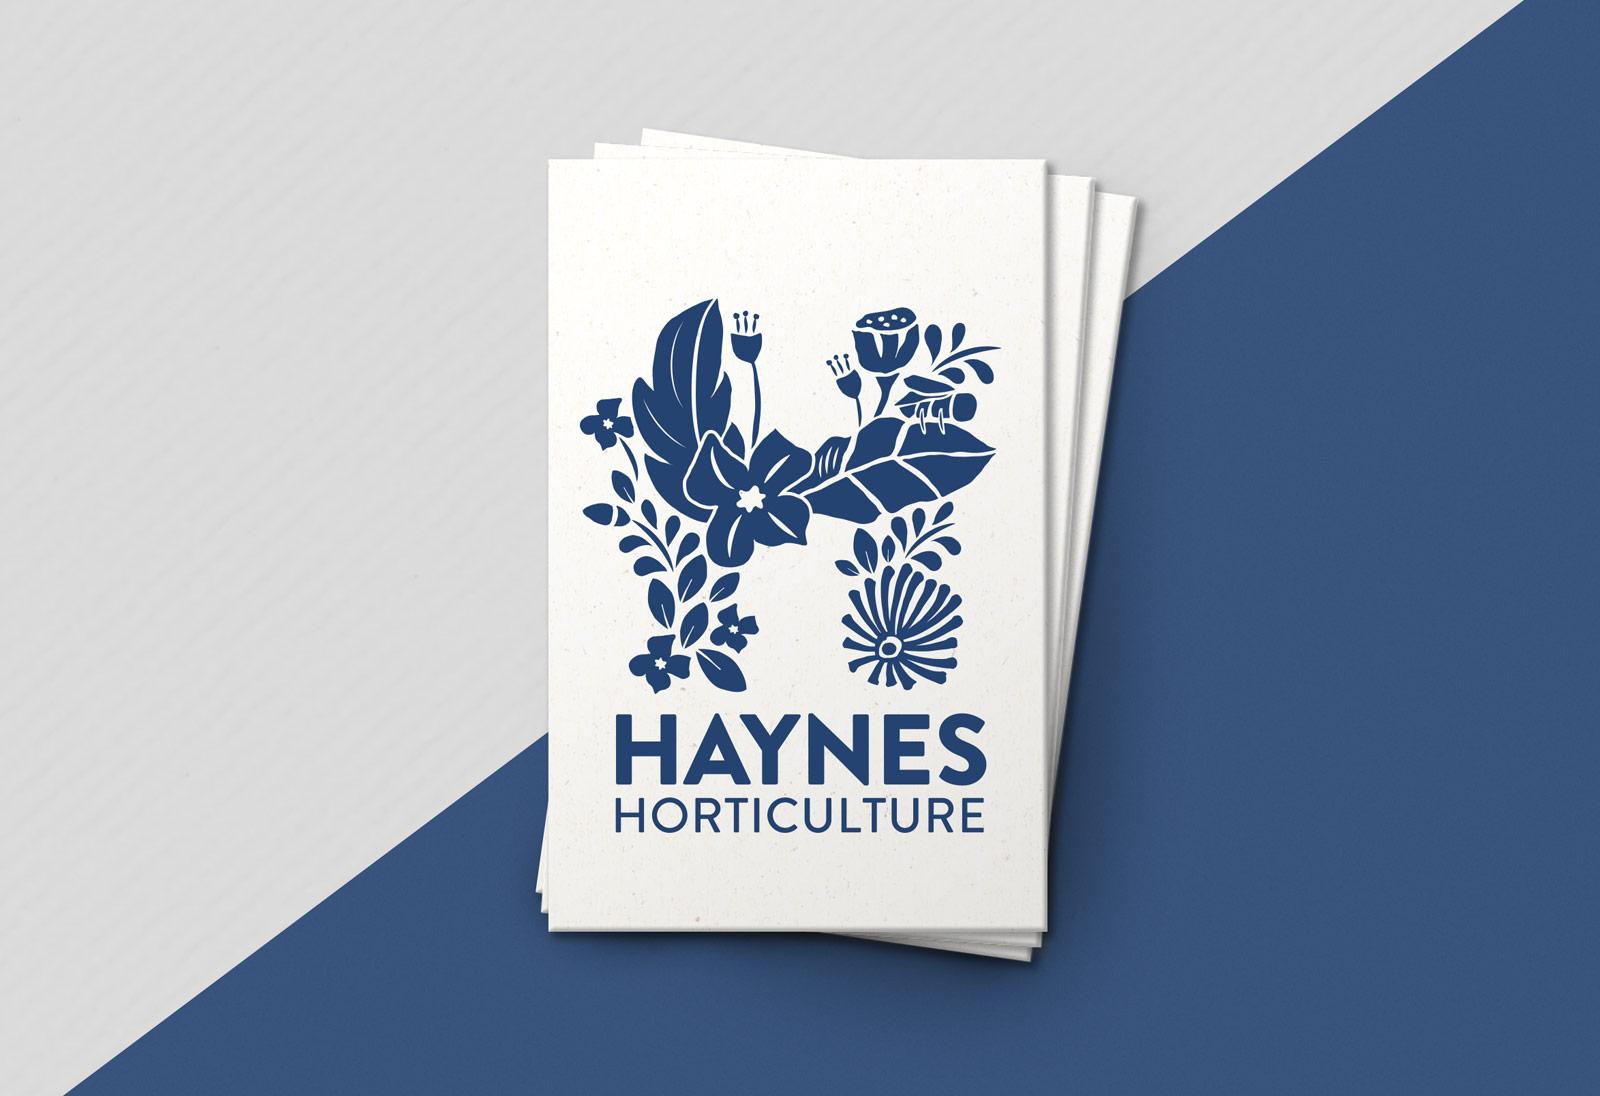 Haynes Horticulture